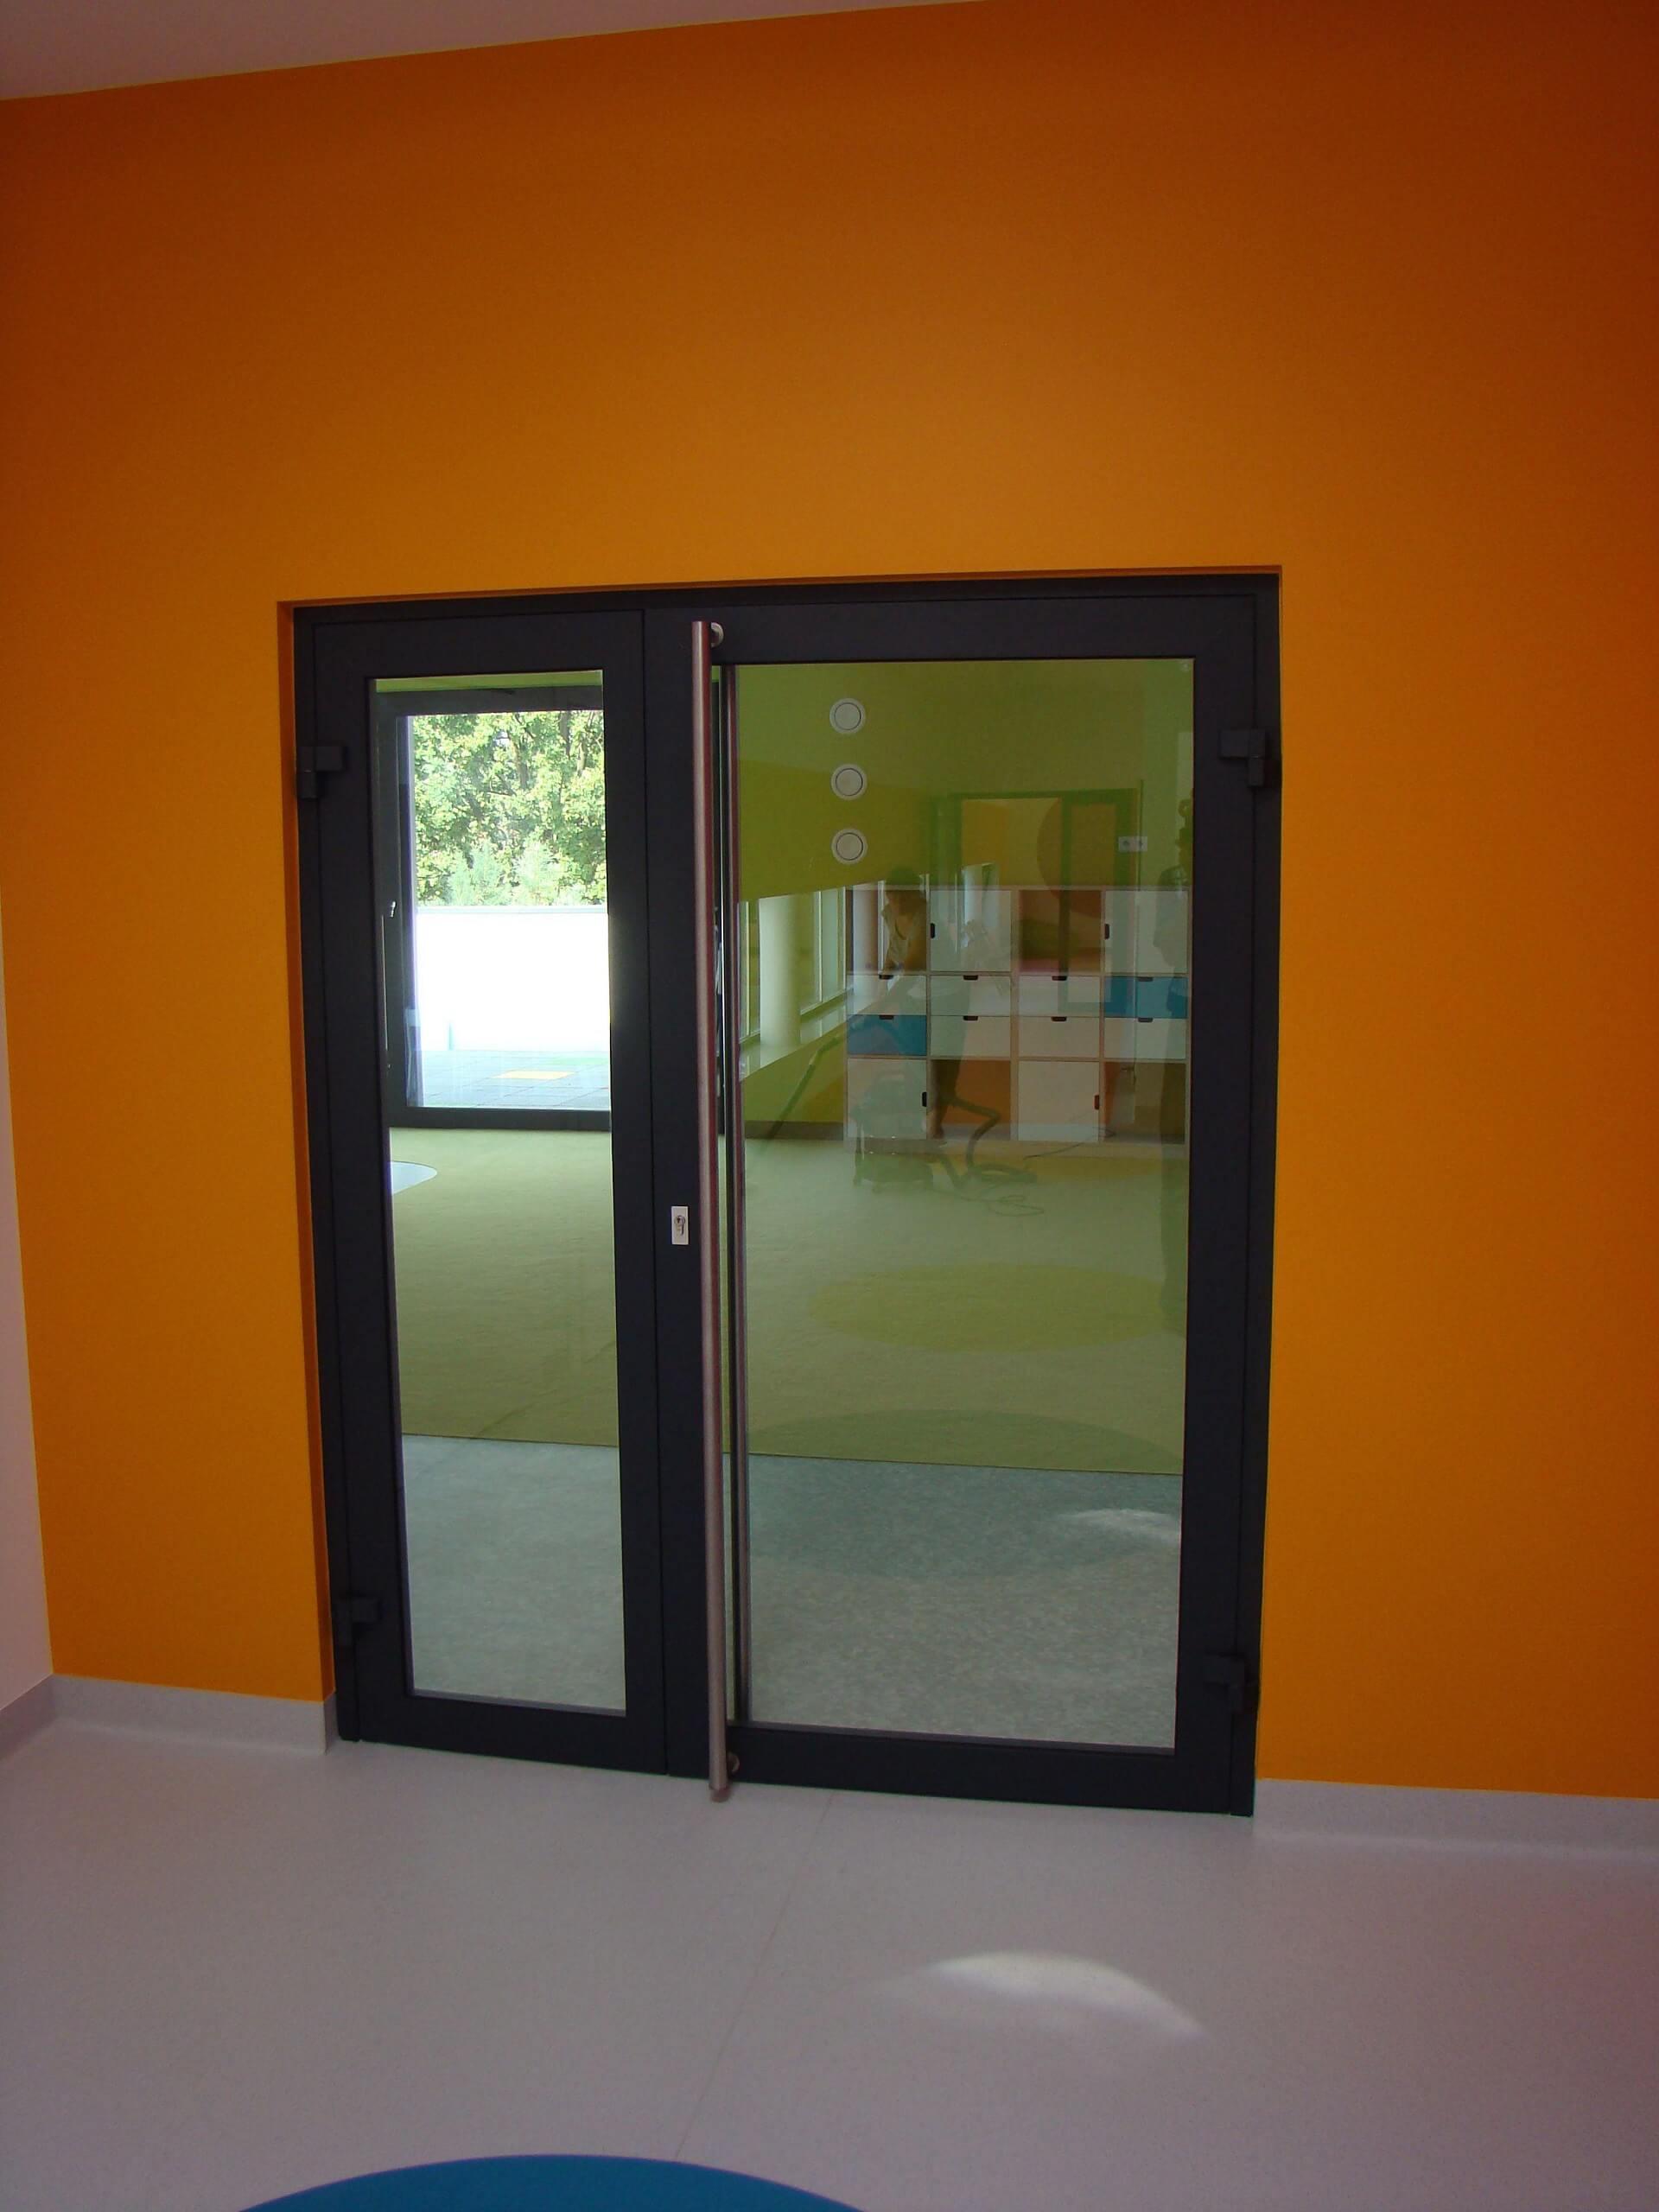 Okna i witryny aluminiowe